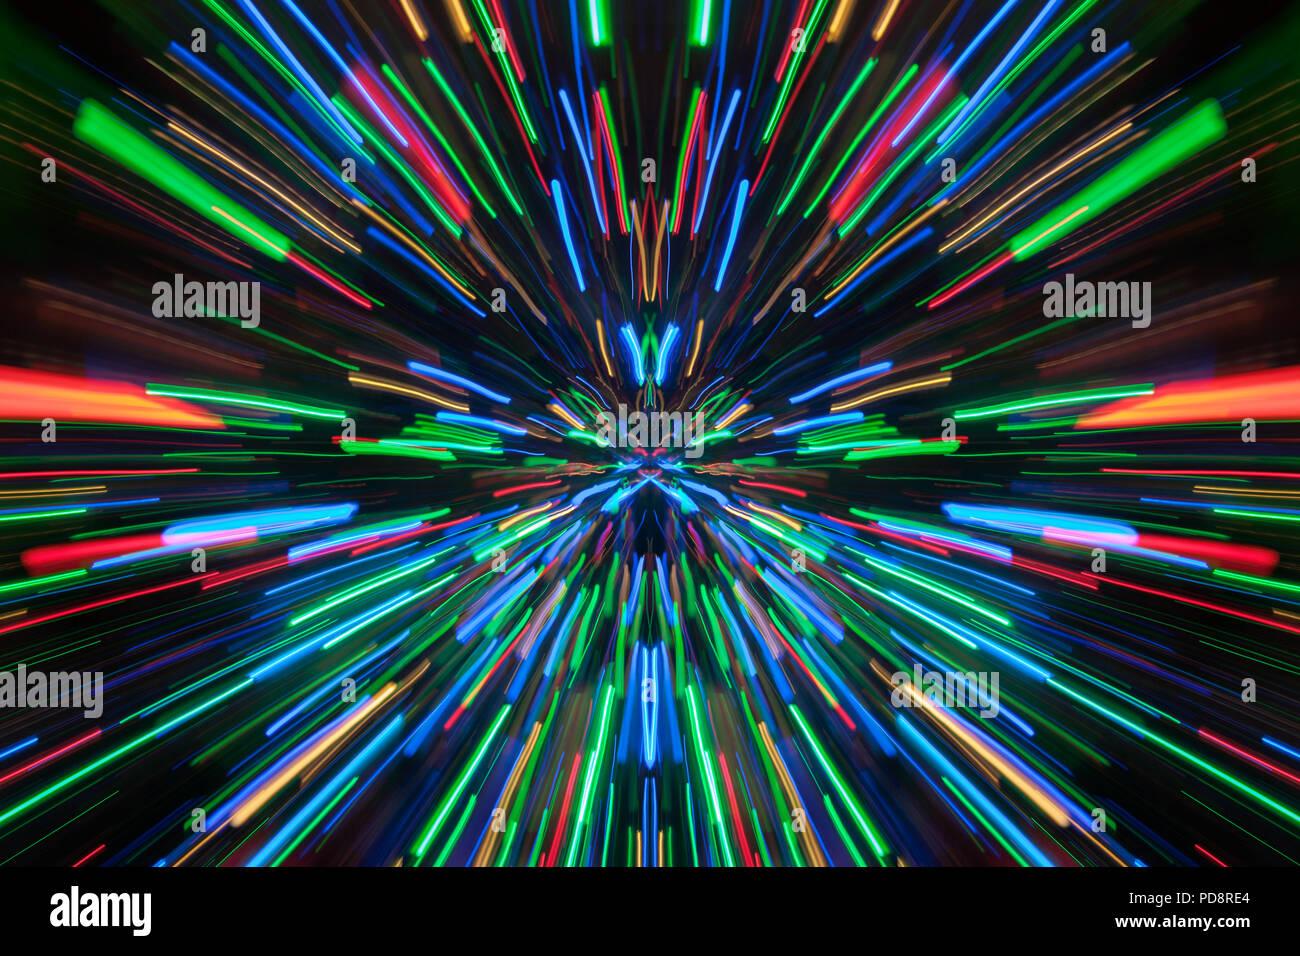 Abstract lighting effect. Stock Photo